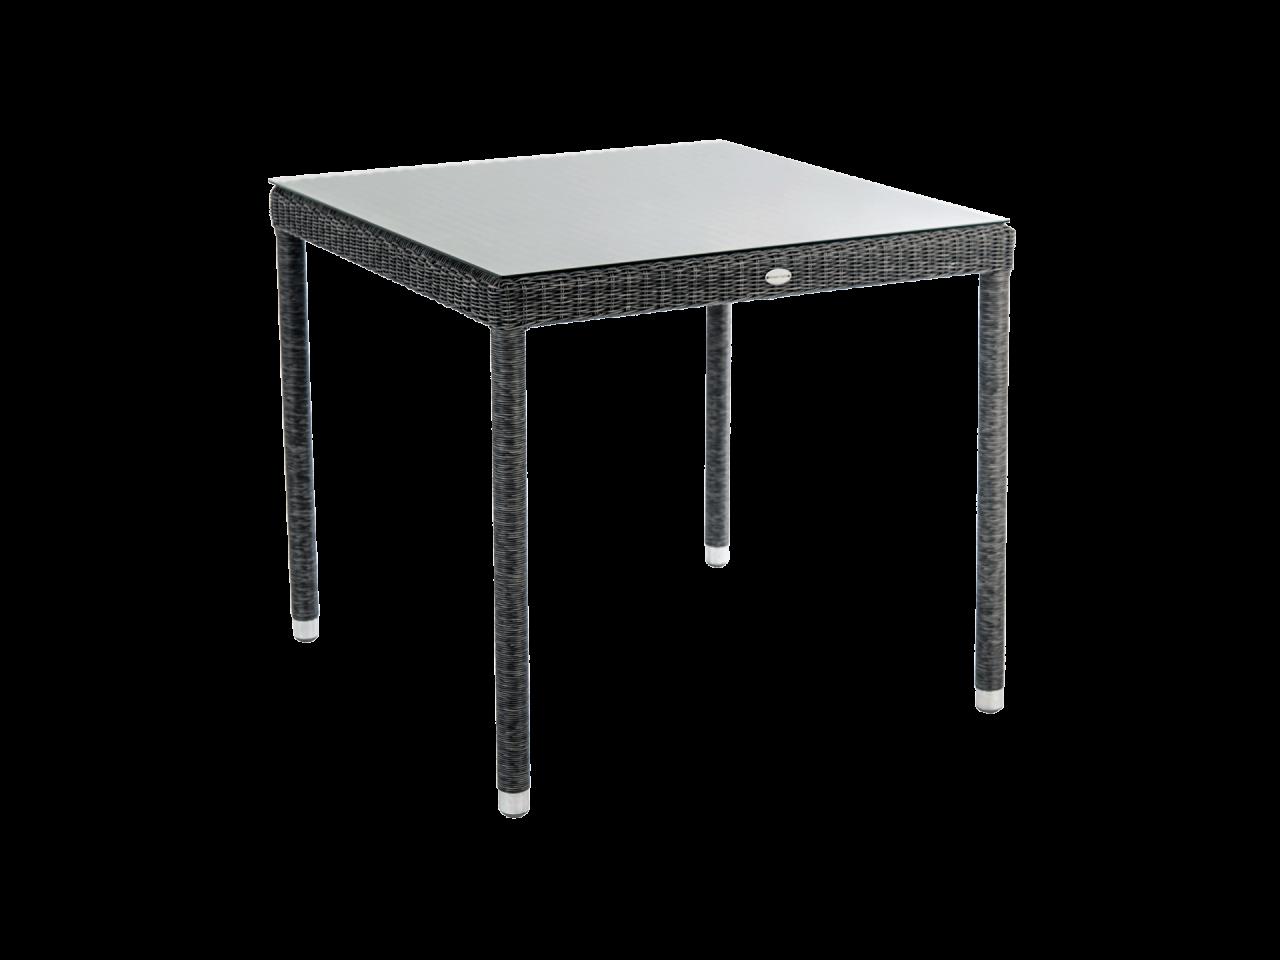 Стол Monte Carlo 0.8 X 0.8 м.